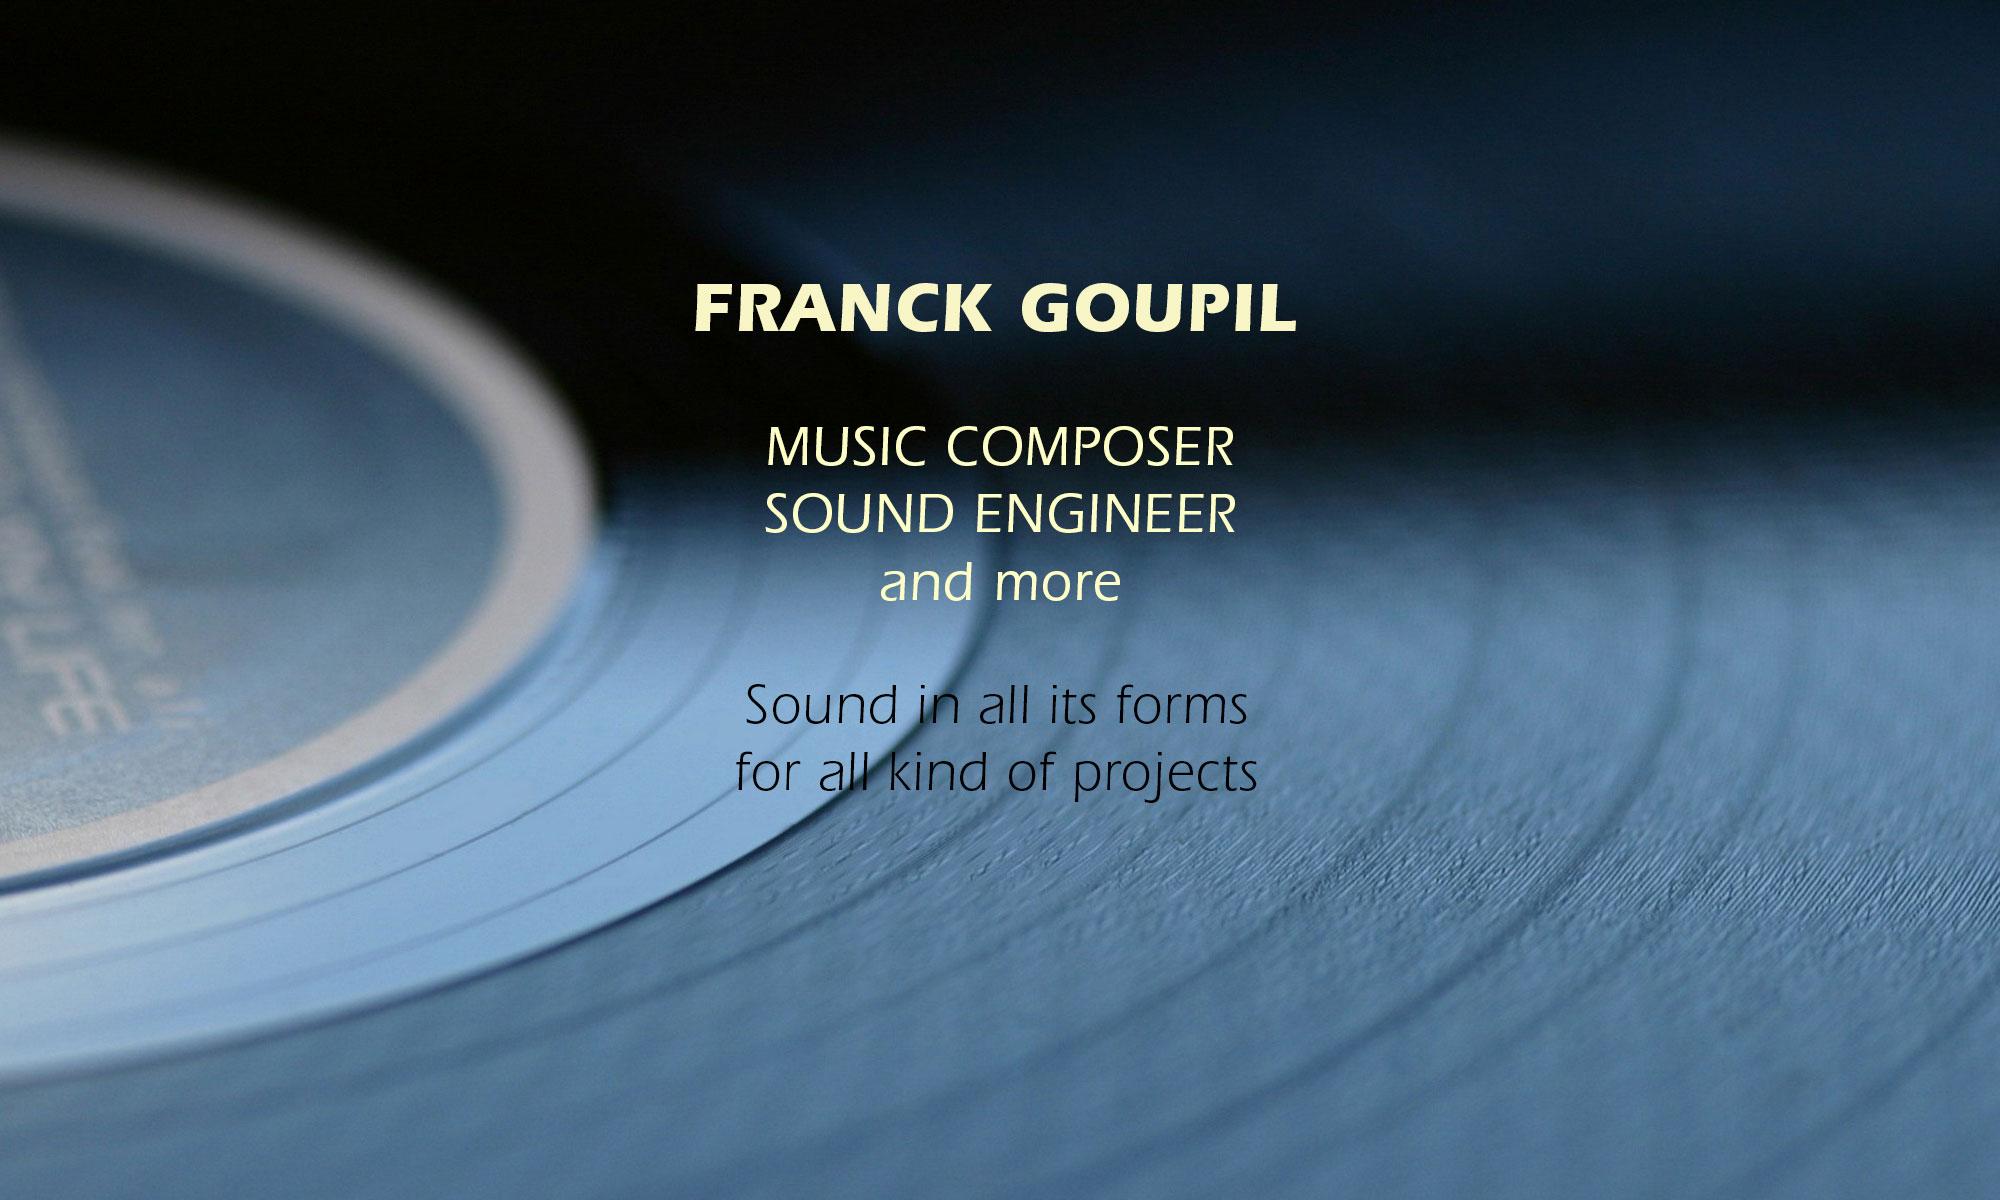 FRANCK GOUPIL